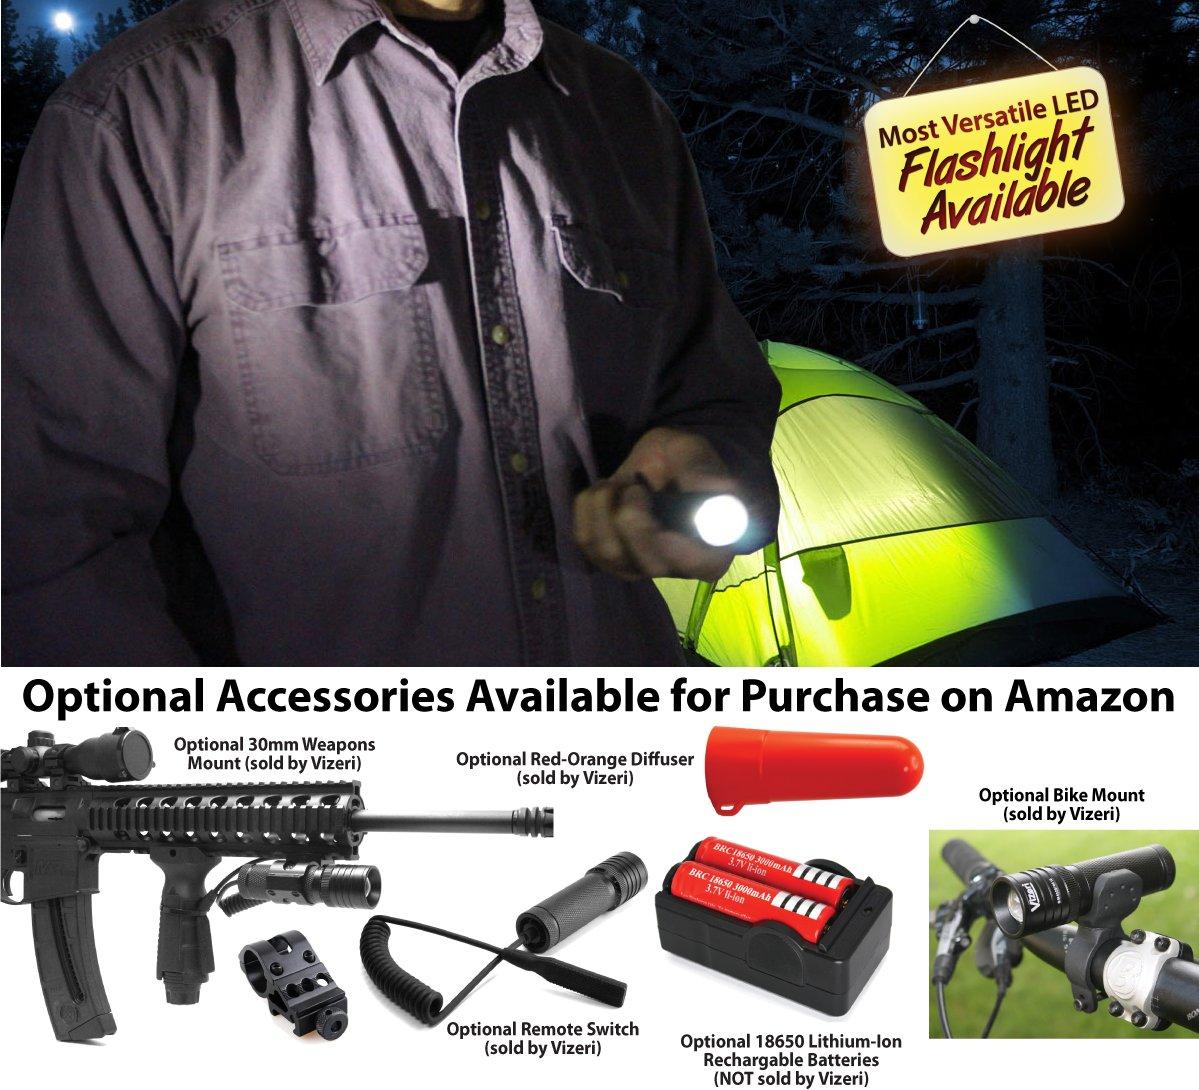 Best flashlights? fenix flashlight, surefire flashlight, streamlight flashlight review